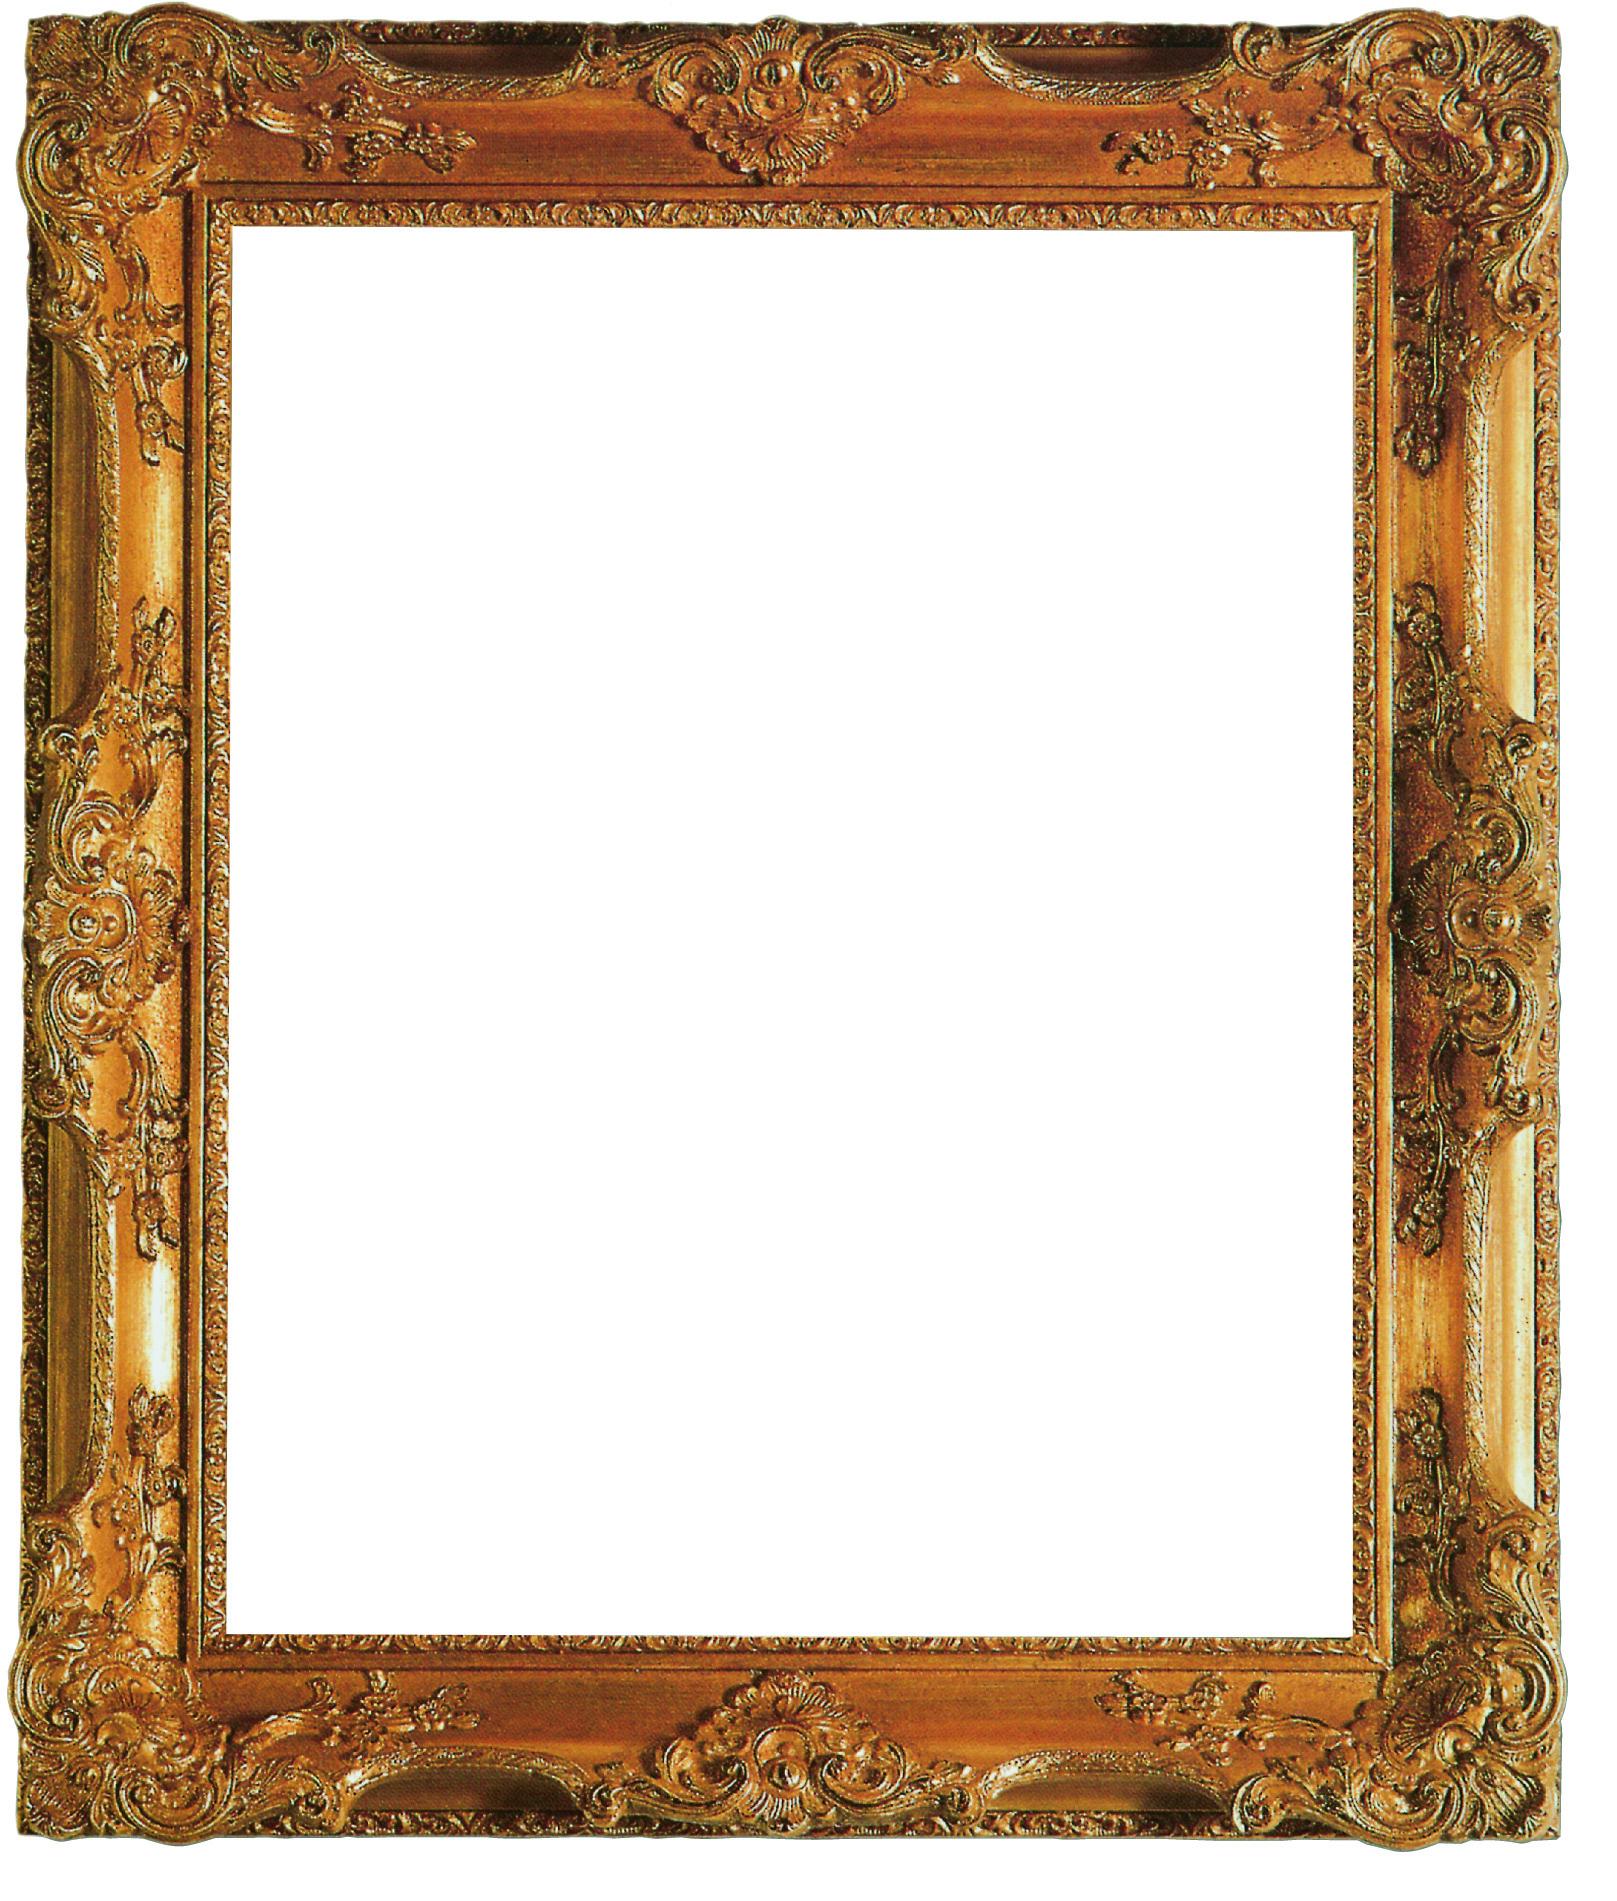 Stilrahmen - Barockbilderrahmen